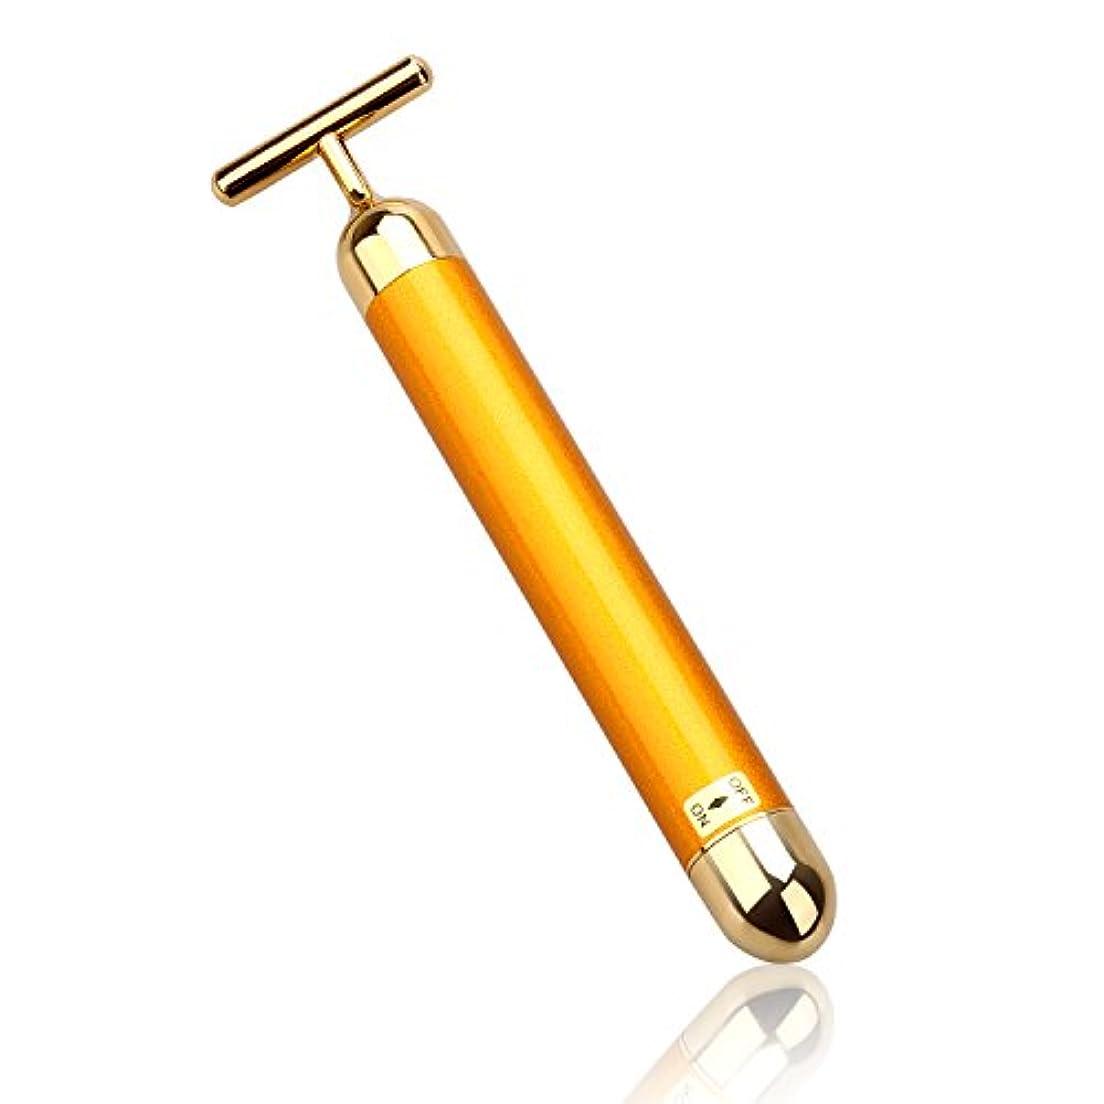 LEVIN 電動美顔器 ビューティーバー フェイスパー 電動美顔器 美肌 防水 ゴールド